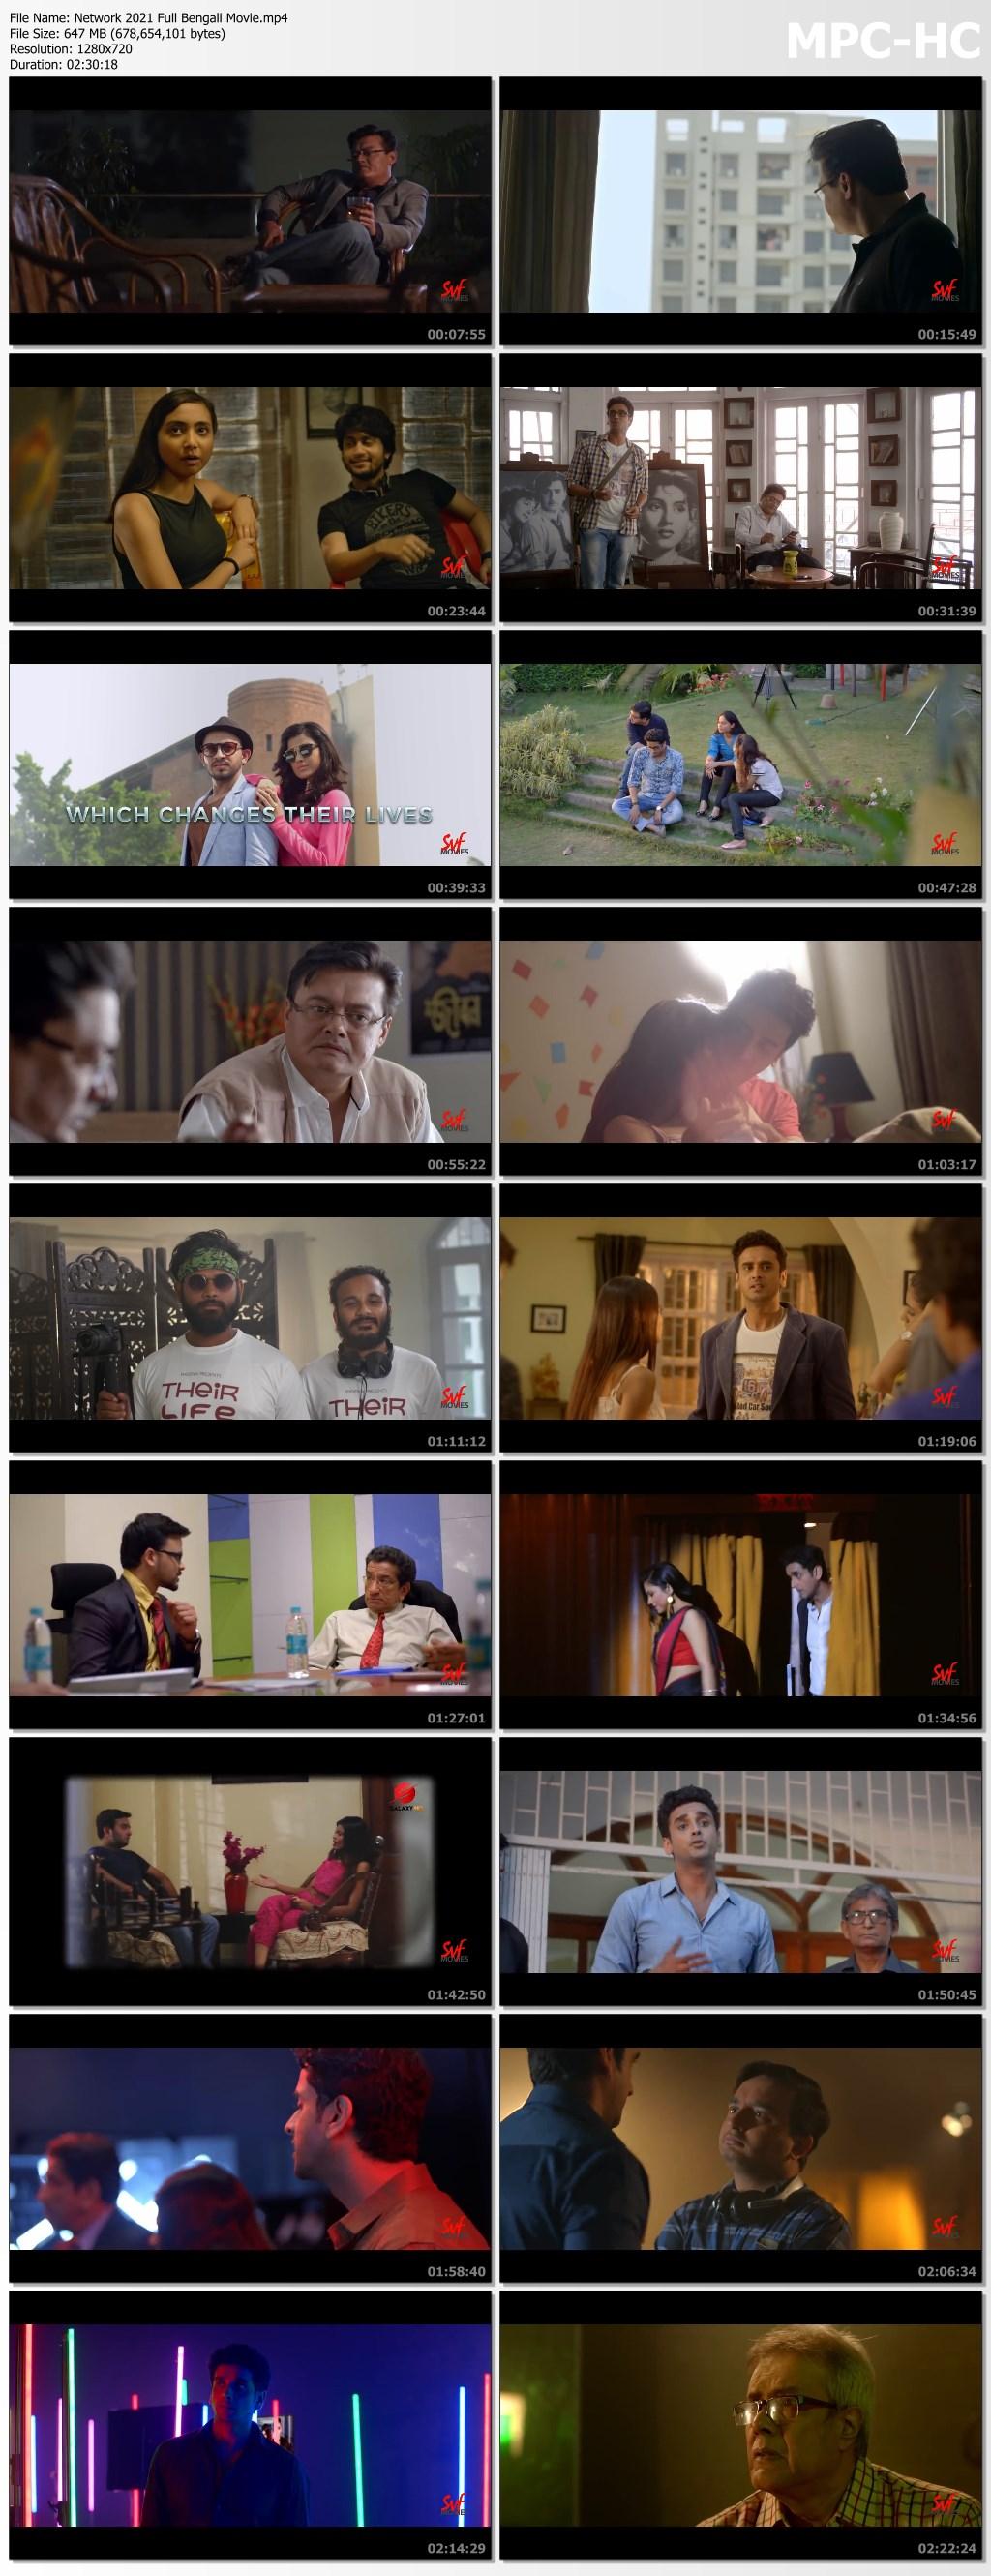 Network 2021 Full Bengali Movie.mp4 thumbs